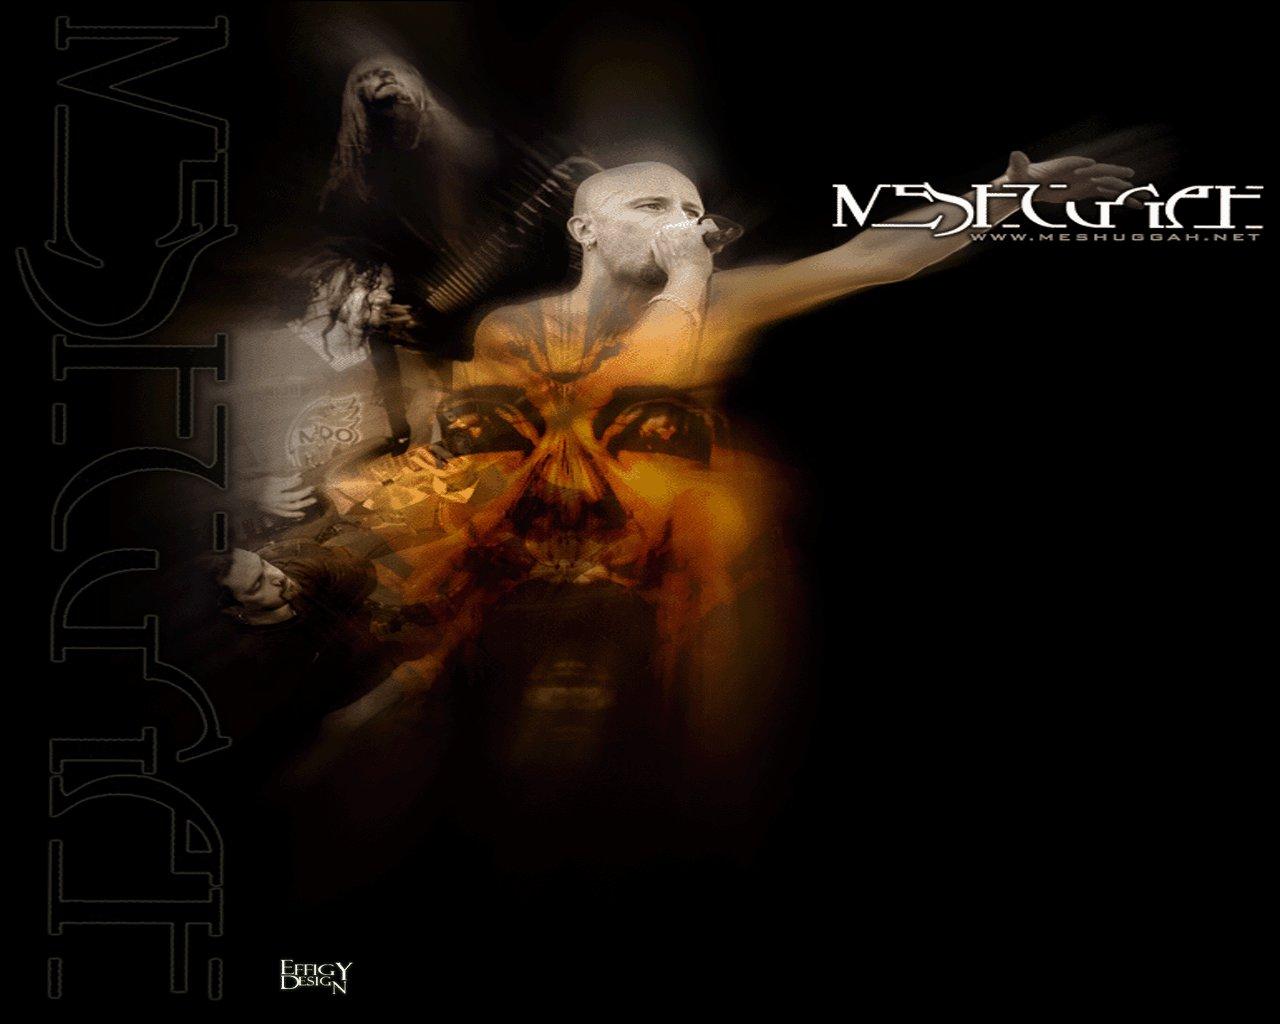 Meshuggahnet Wallpaper by Bloodwork  on deviantART 1280x1024